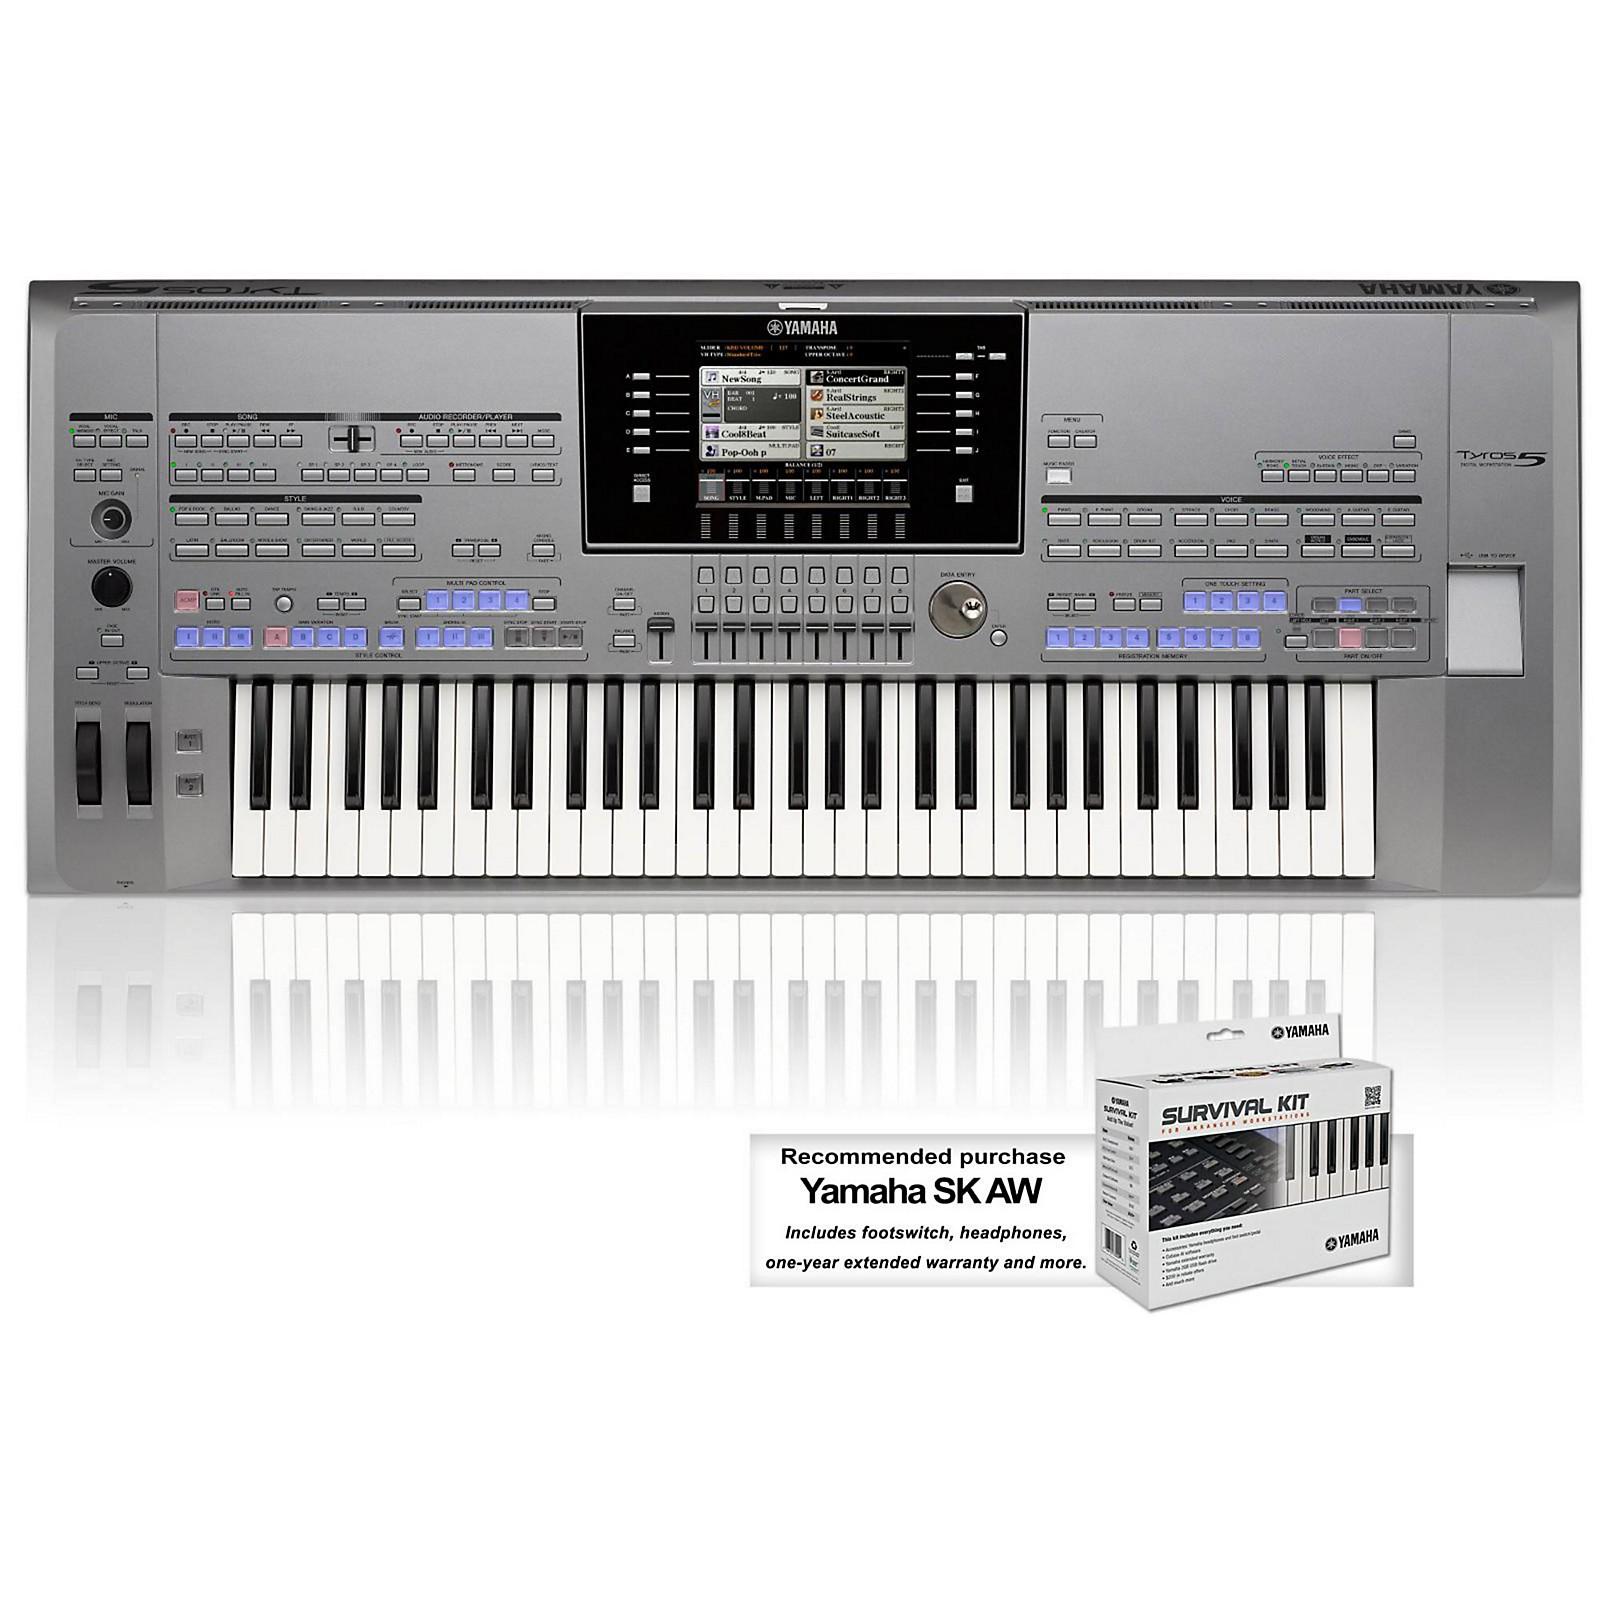 Yamaha Tyros5 61-Key Arranger Workstation